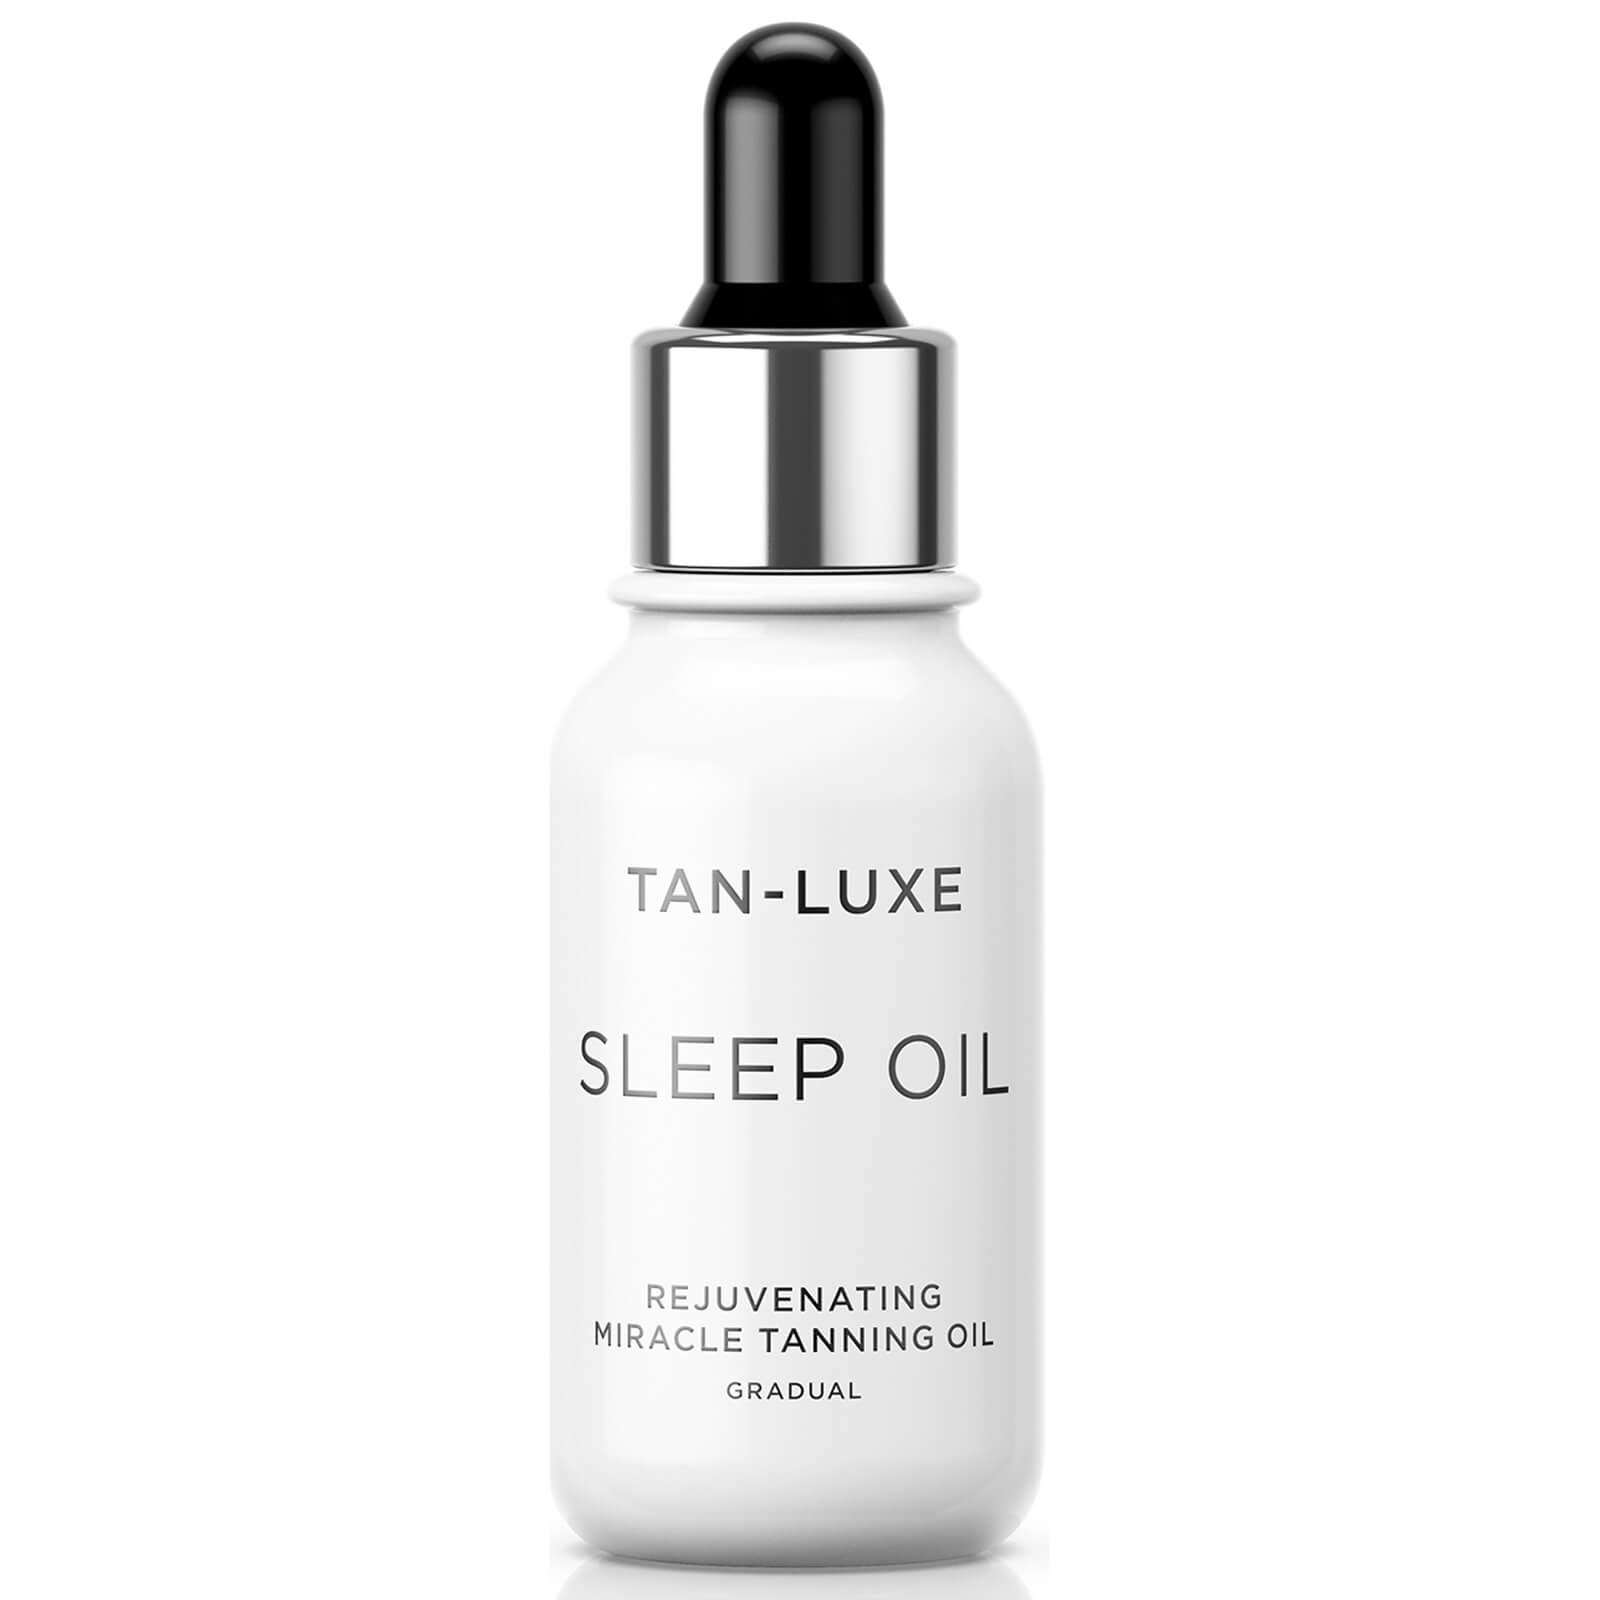 Tan-Luxe Sleep Oil Rejuvenating Miracle Tanning Oil 20ml